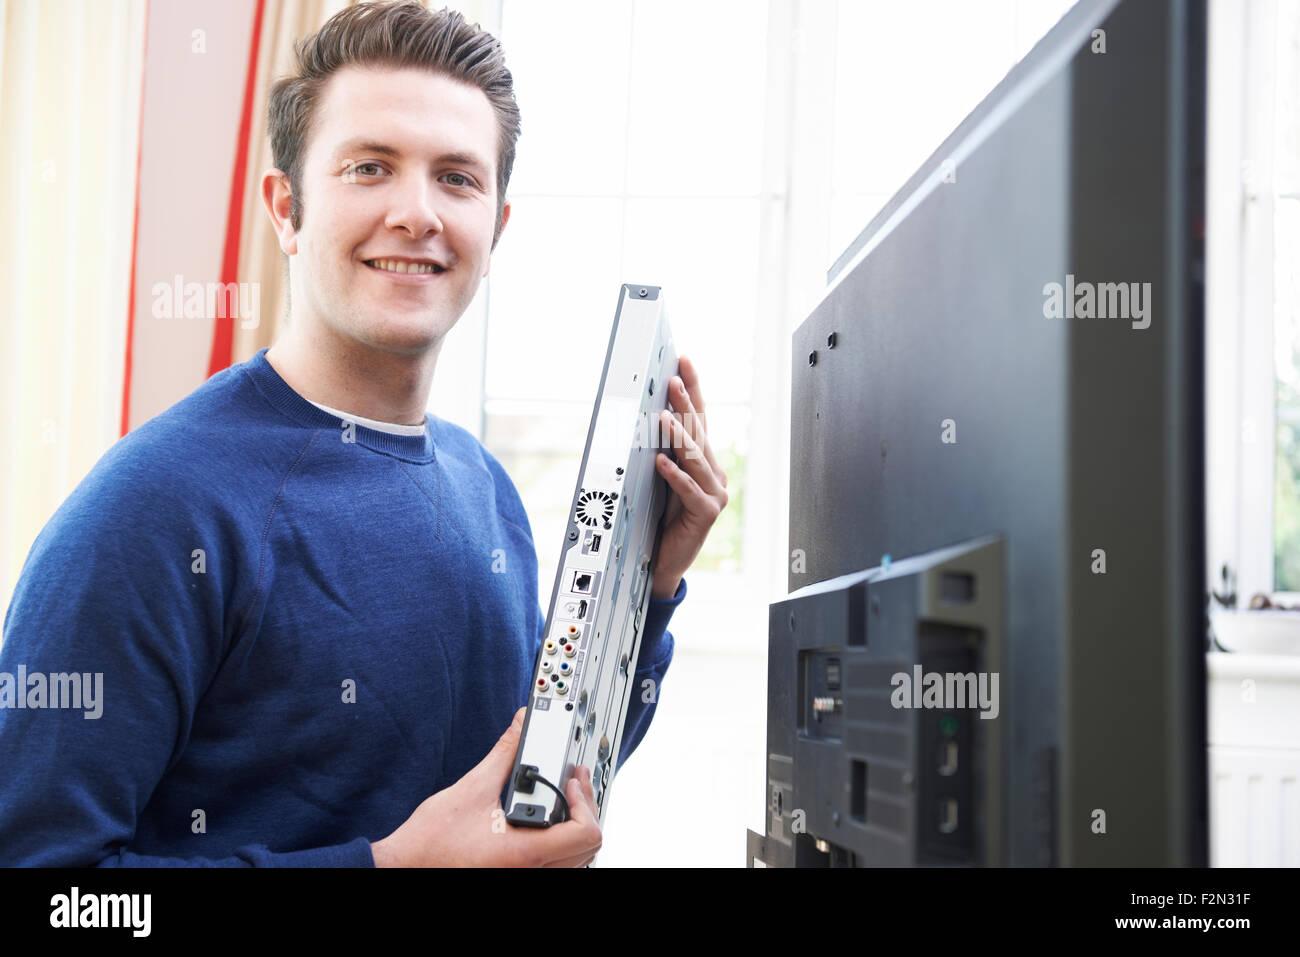 Portrait Of Engineer Installing Digital TV Equipment - Stock Image